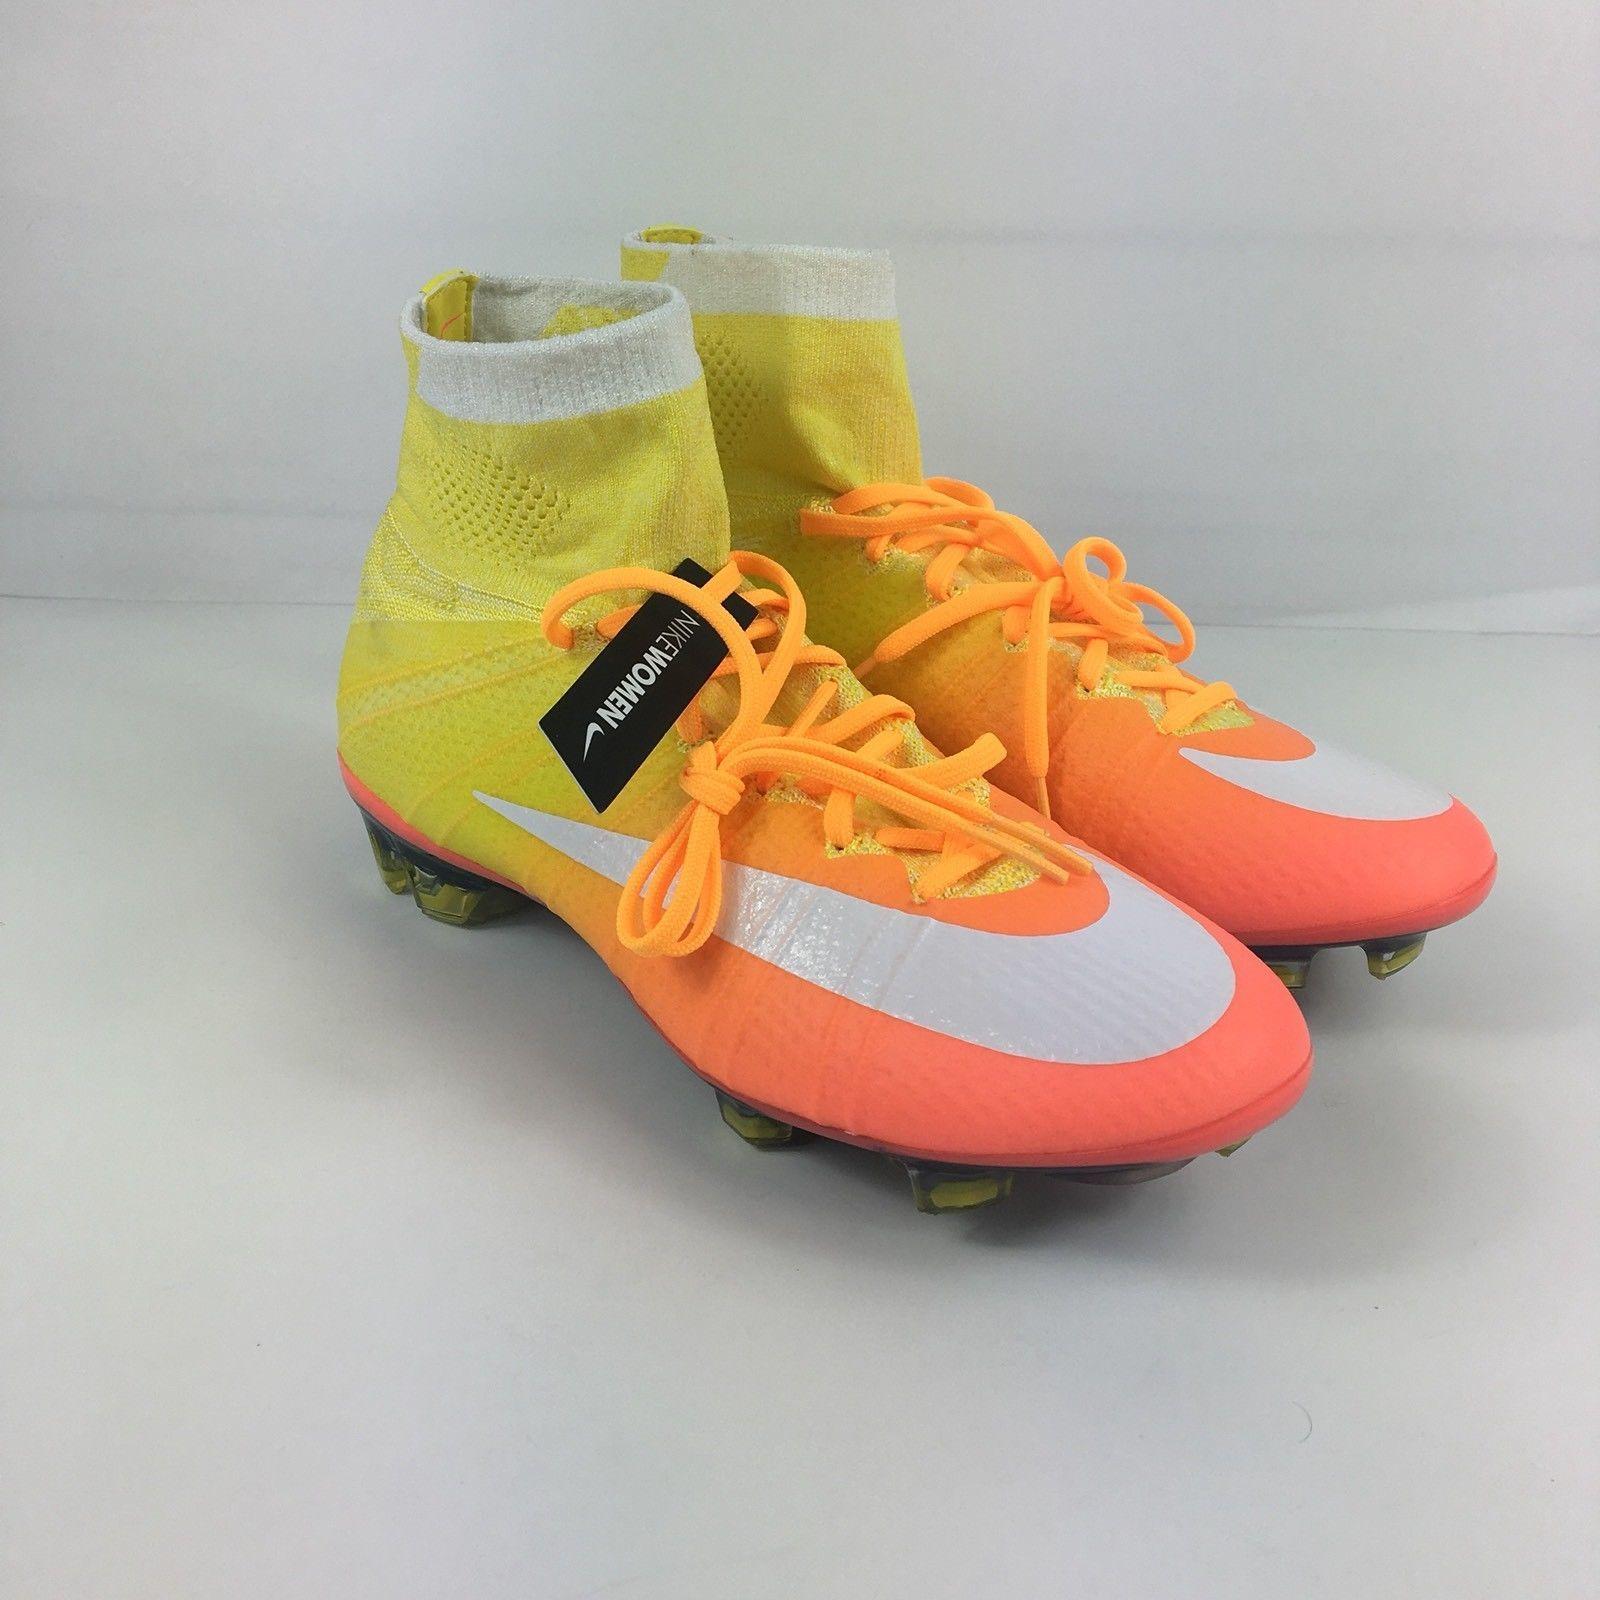 afbd75bcd0ca S l1600. S l1600. Previous. Nike Womens Mercurial Superfly FG ACC Soccer  Cleats Mango (718753 800) ...